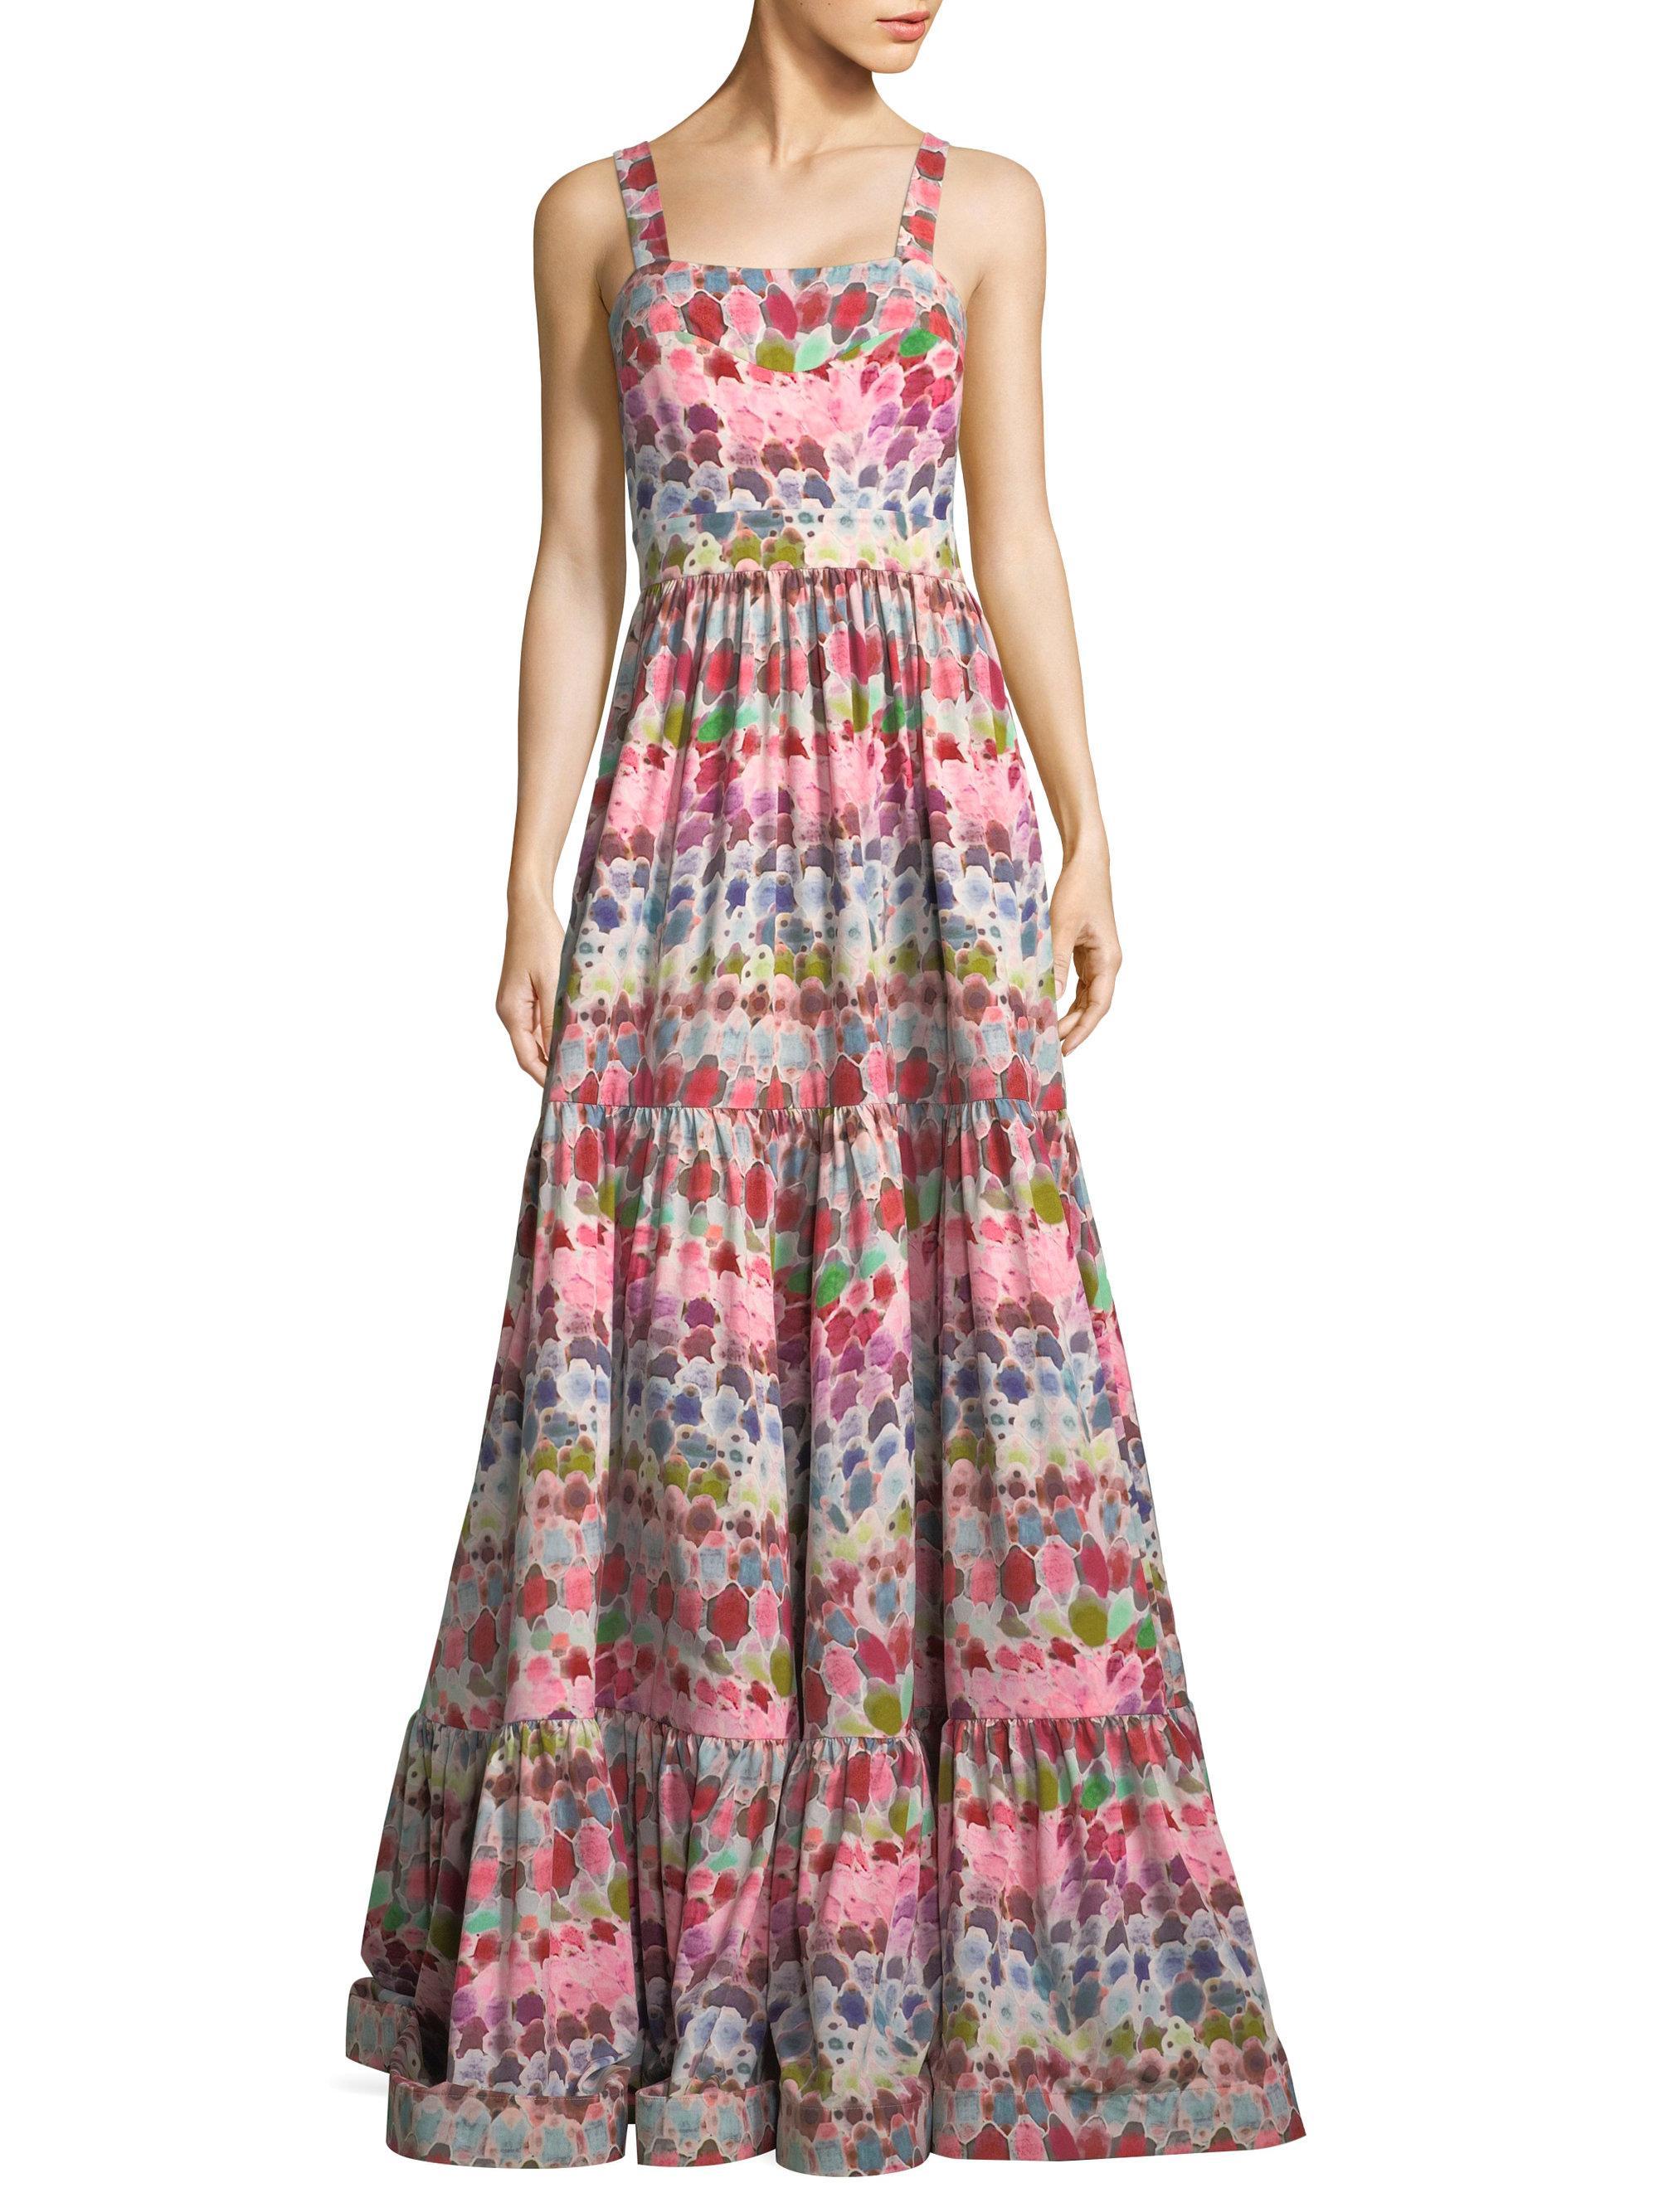 Lyst - Alexis Galia Crepe Dress